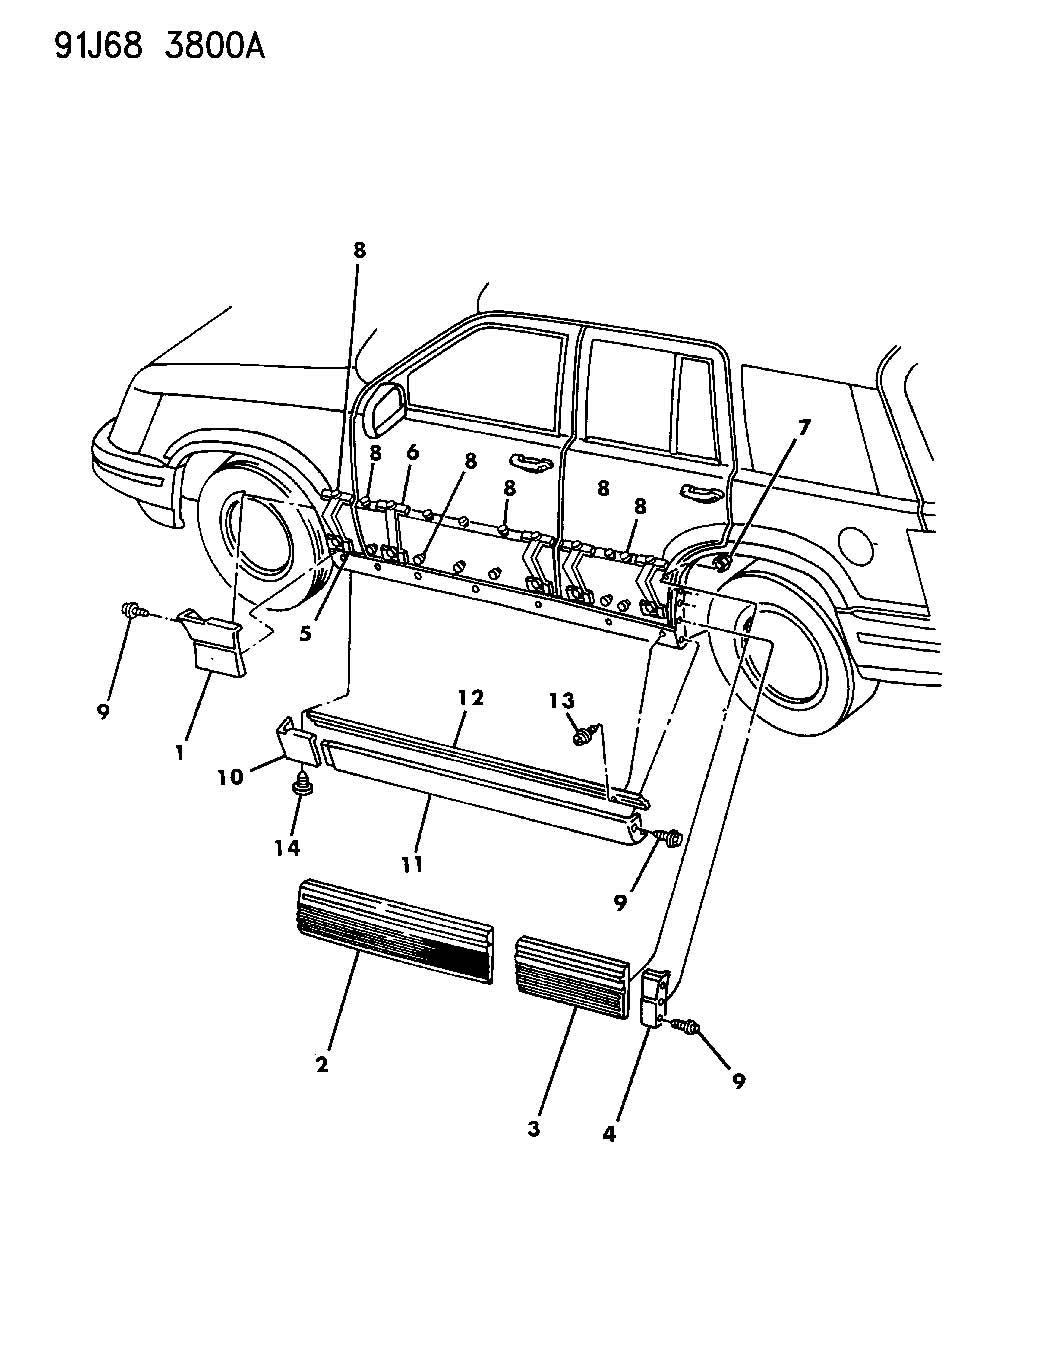 Jeep Cherokee Body Parts on Jeep Grand Cherokee Key Fob Battery